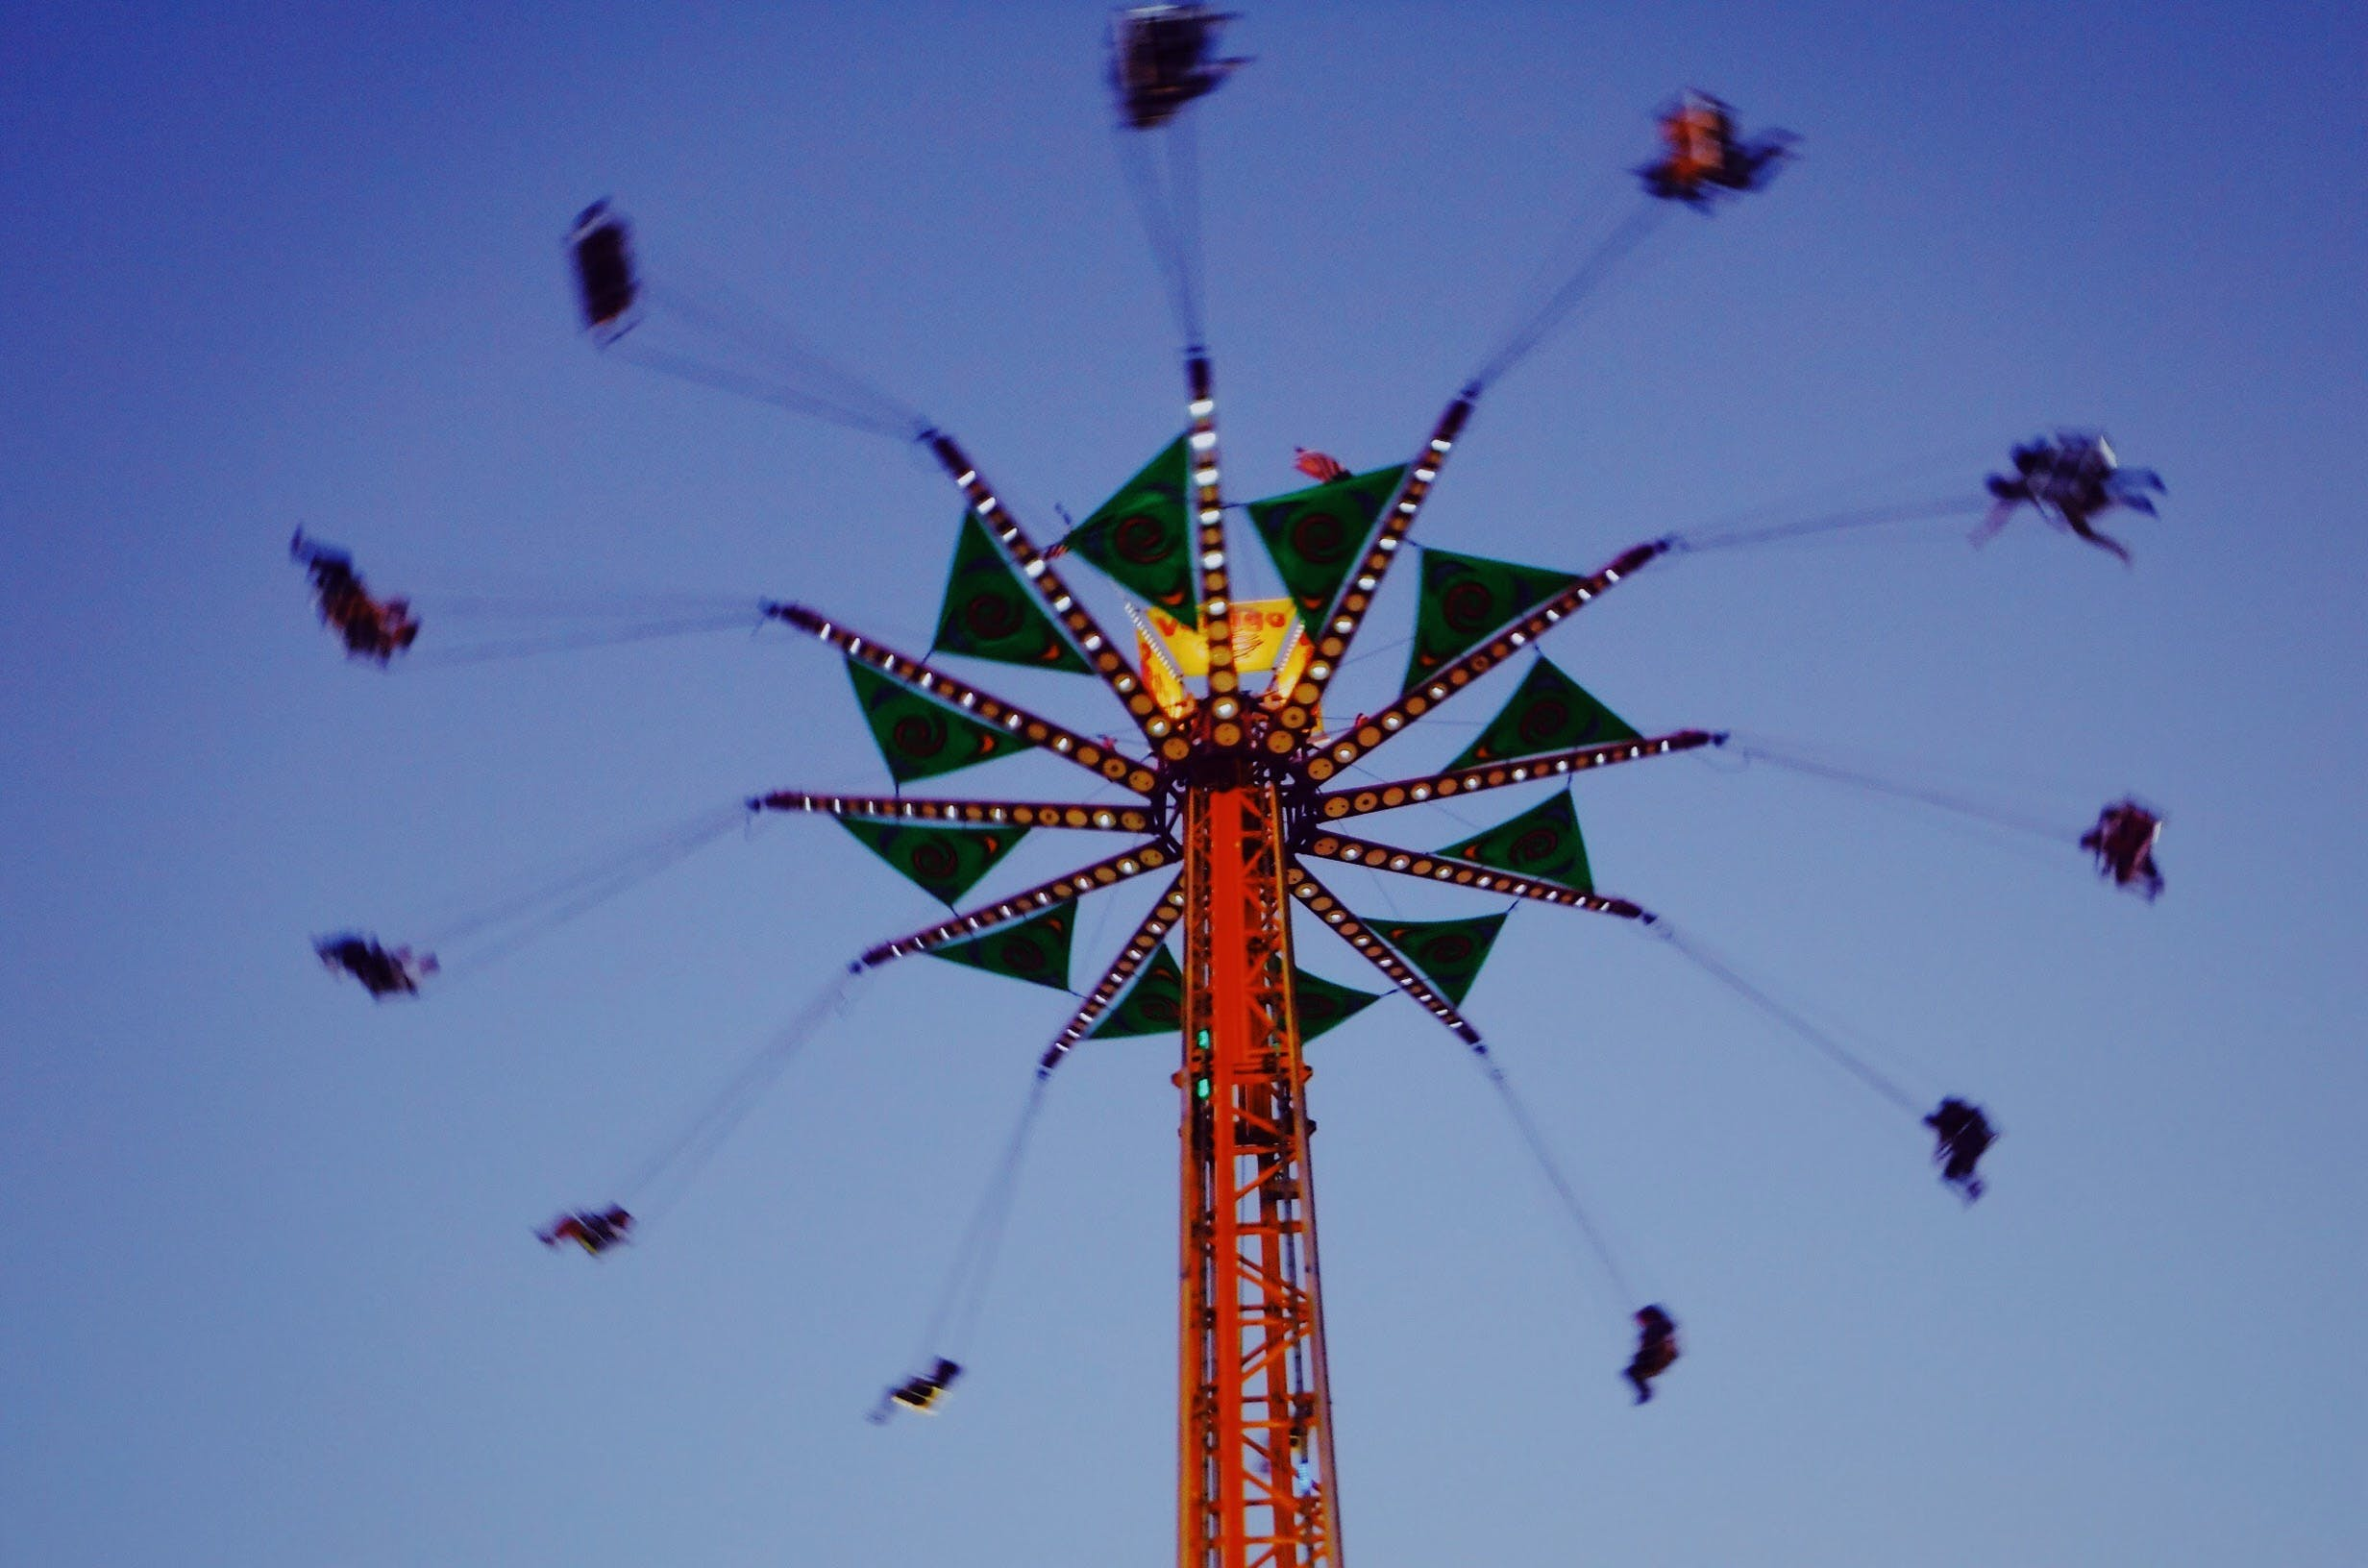 Ride At An Amusement Park